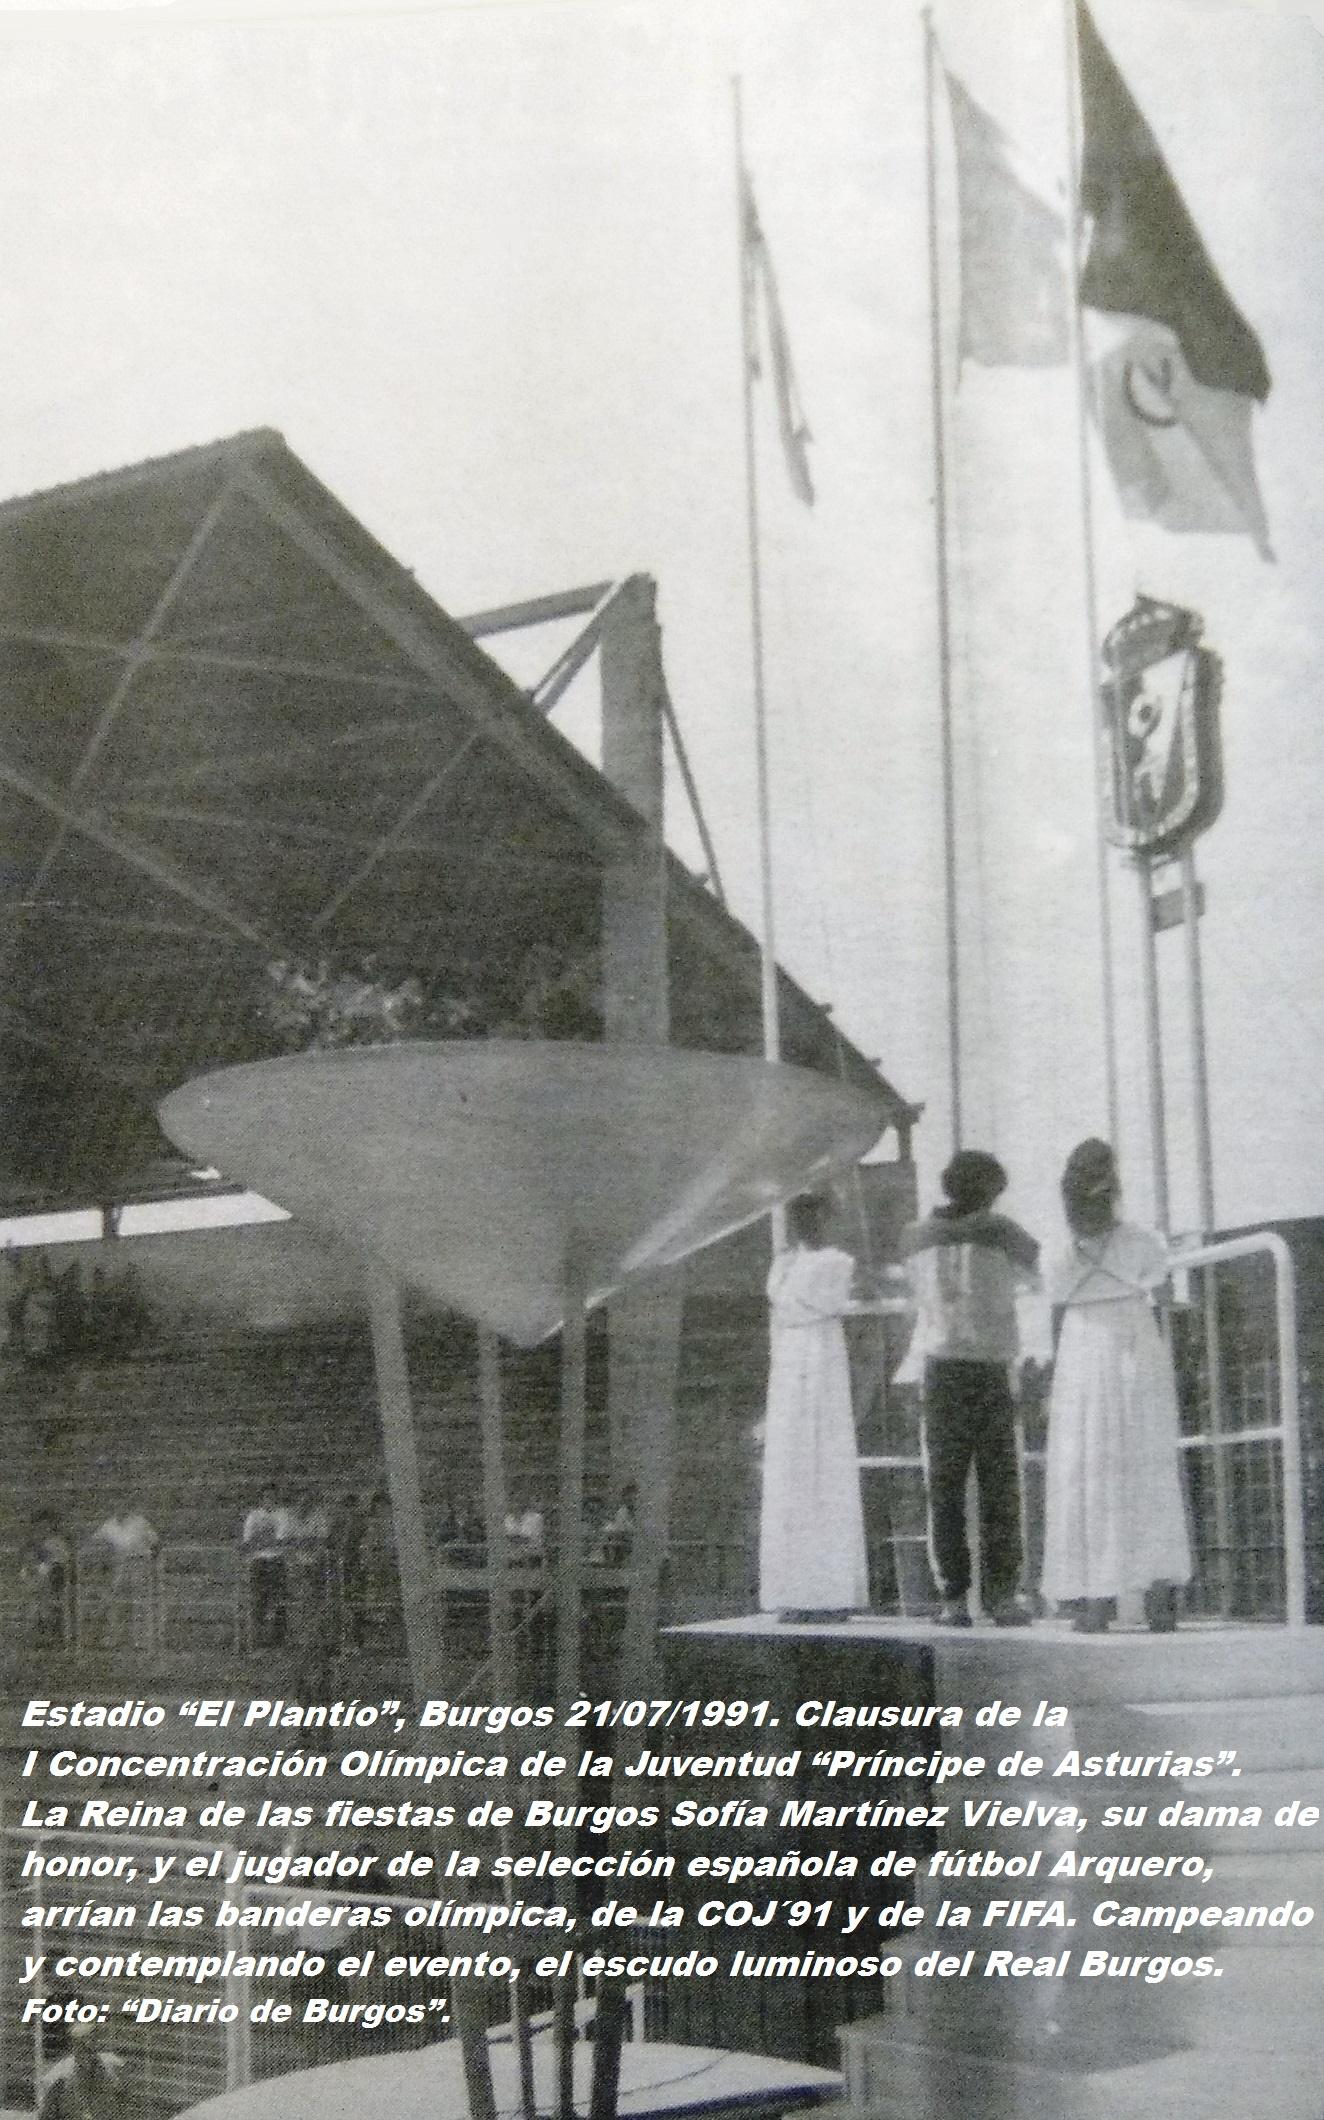 COJ´91.-Clausura.-El-Plantío-Burgos-21-07-1991